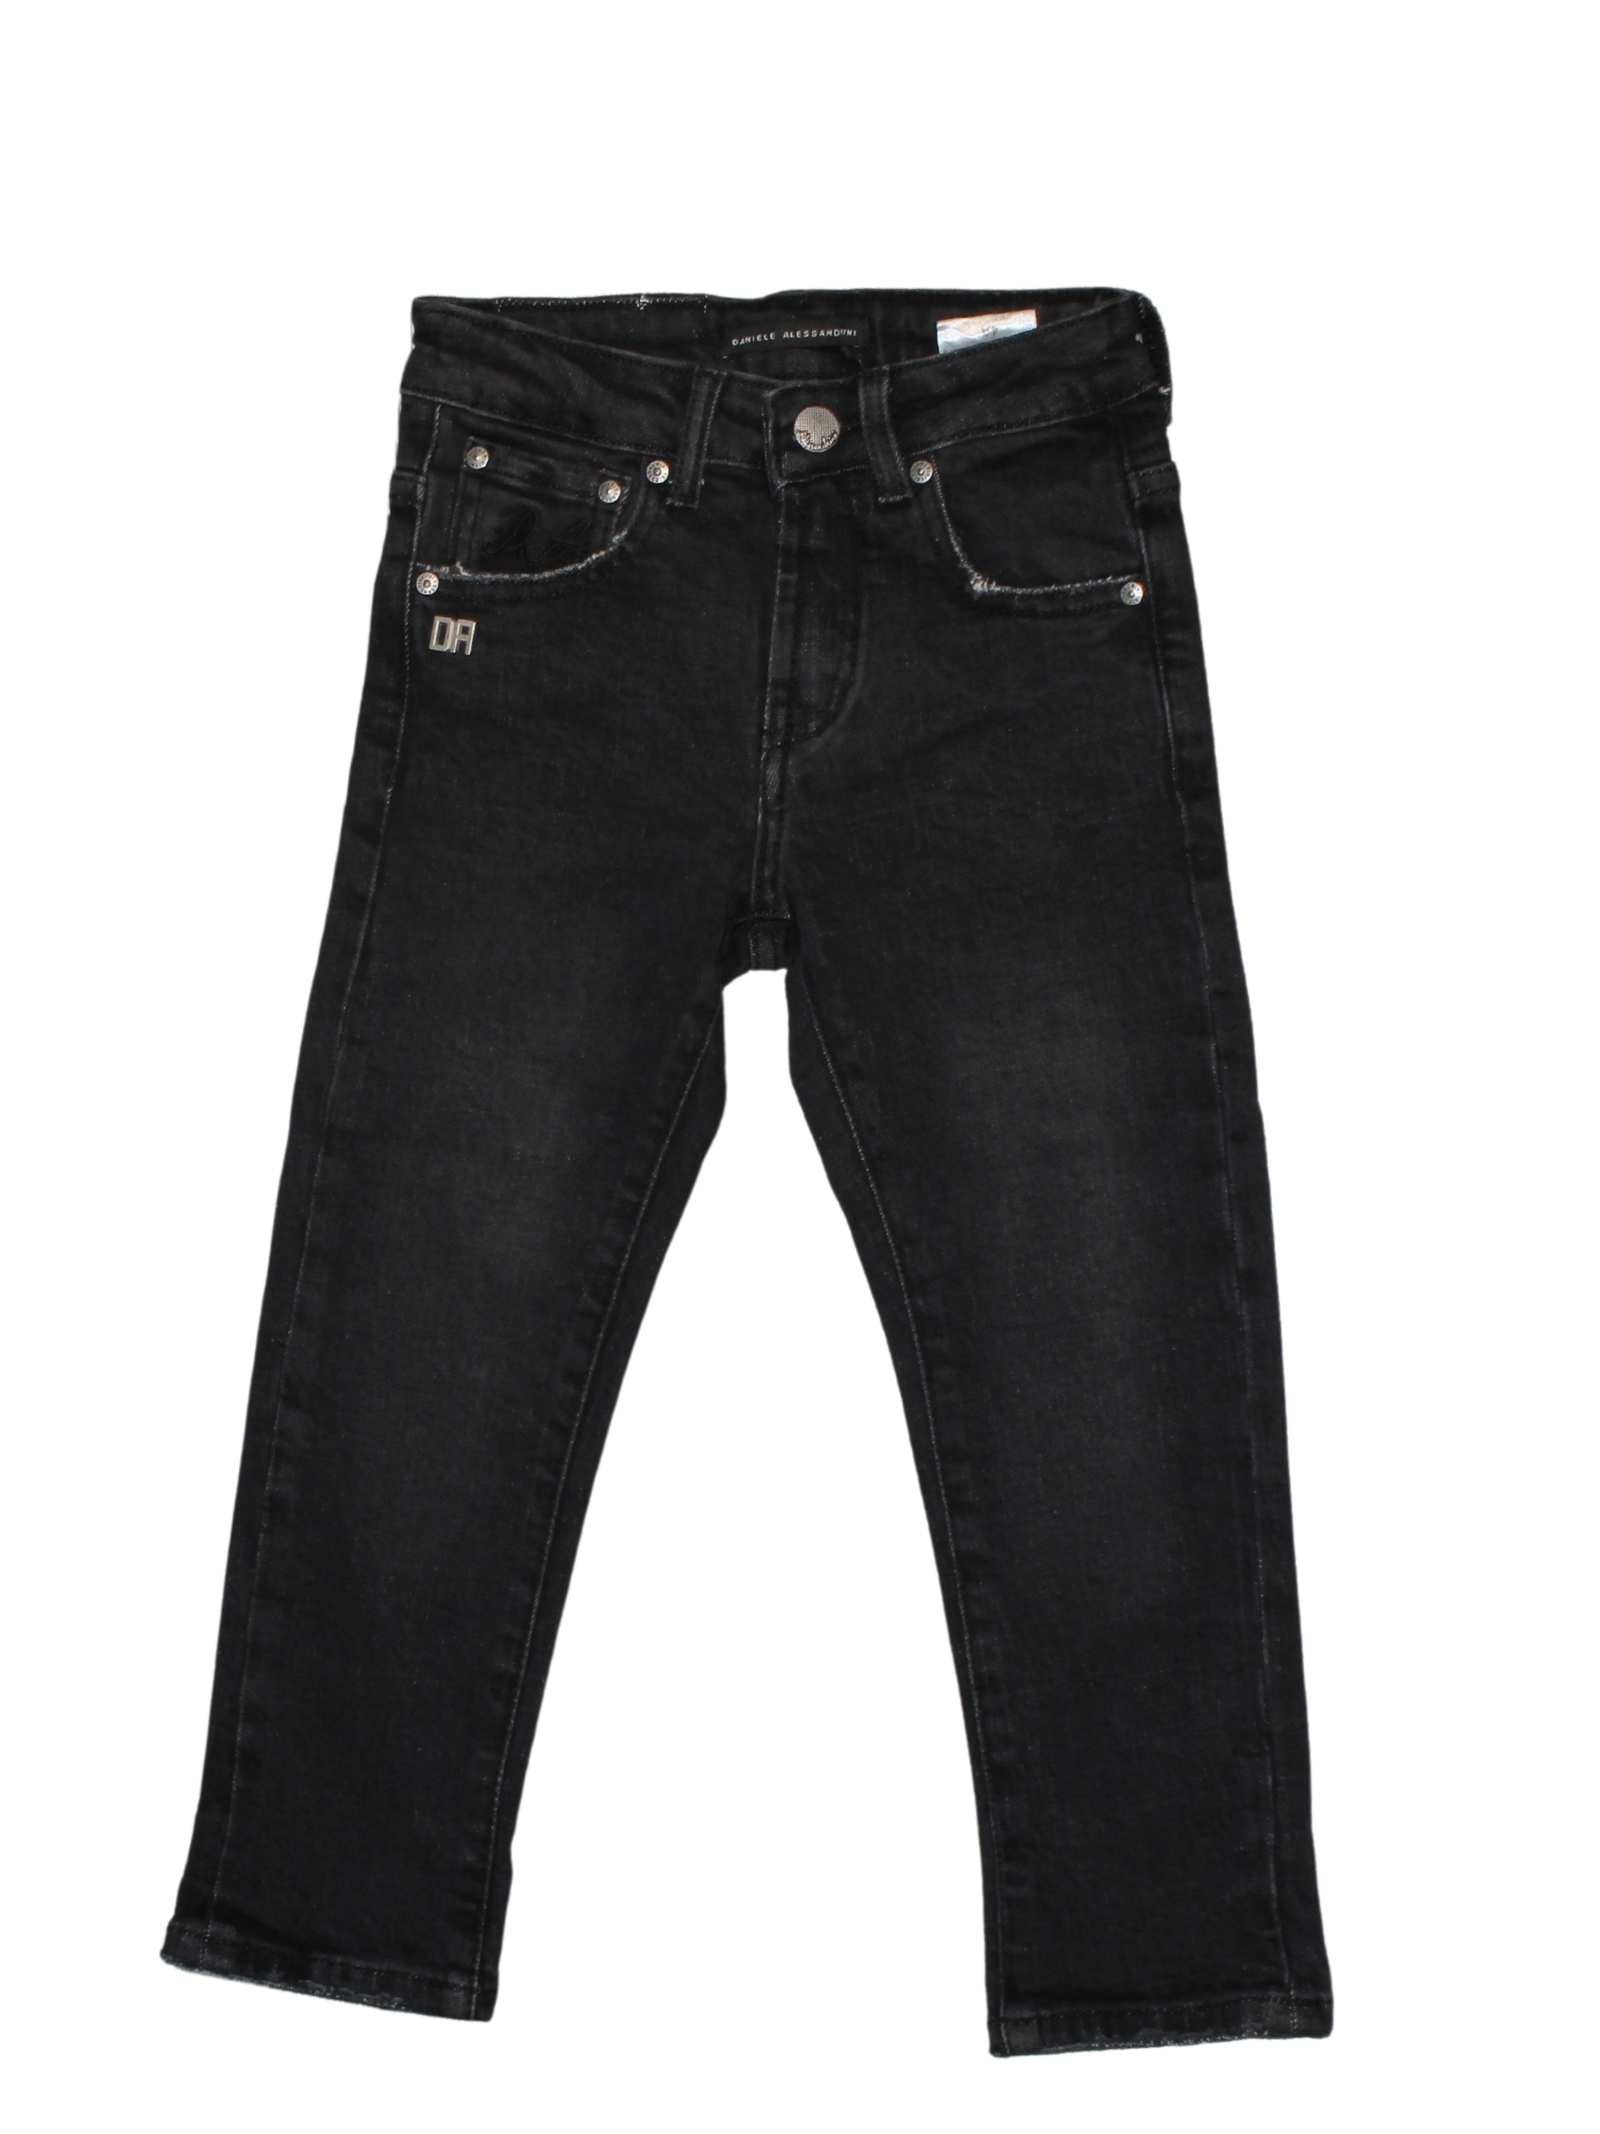 Black Jeans for Boys DANIELE ALESSANDRINI JUNIOR | Trousers | 1231D1039NERO